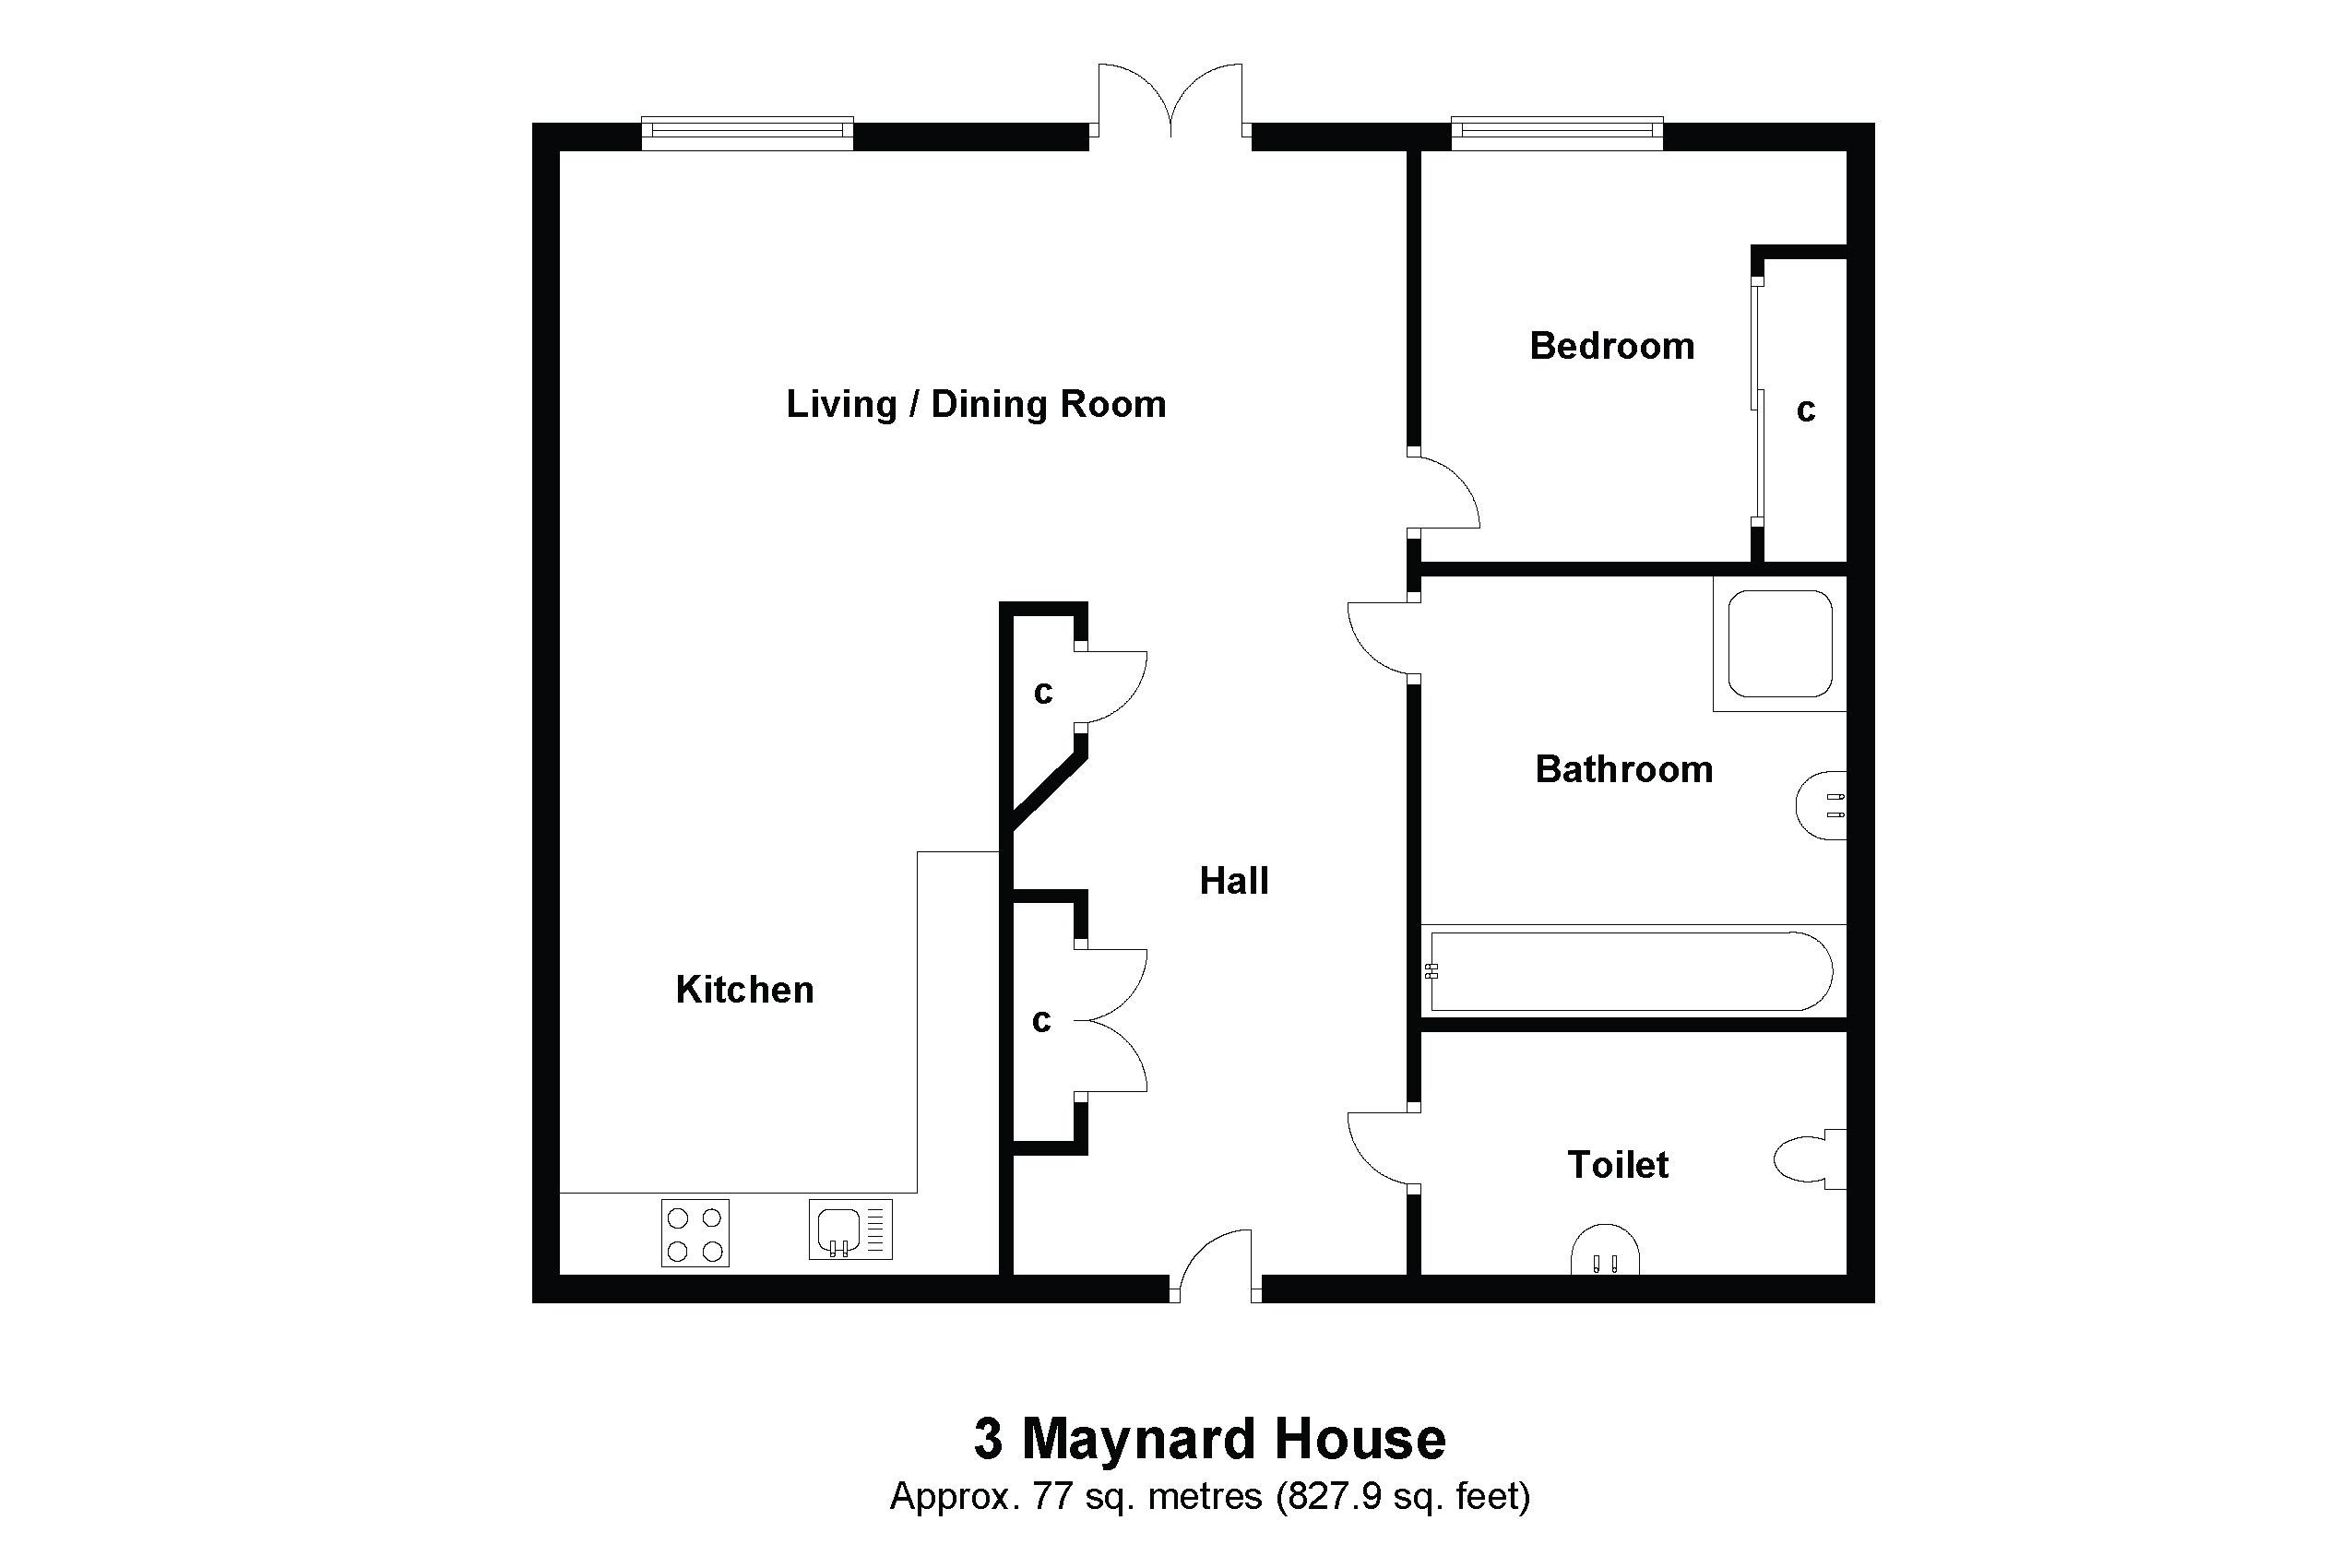 3 Maynard House Floorplan